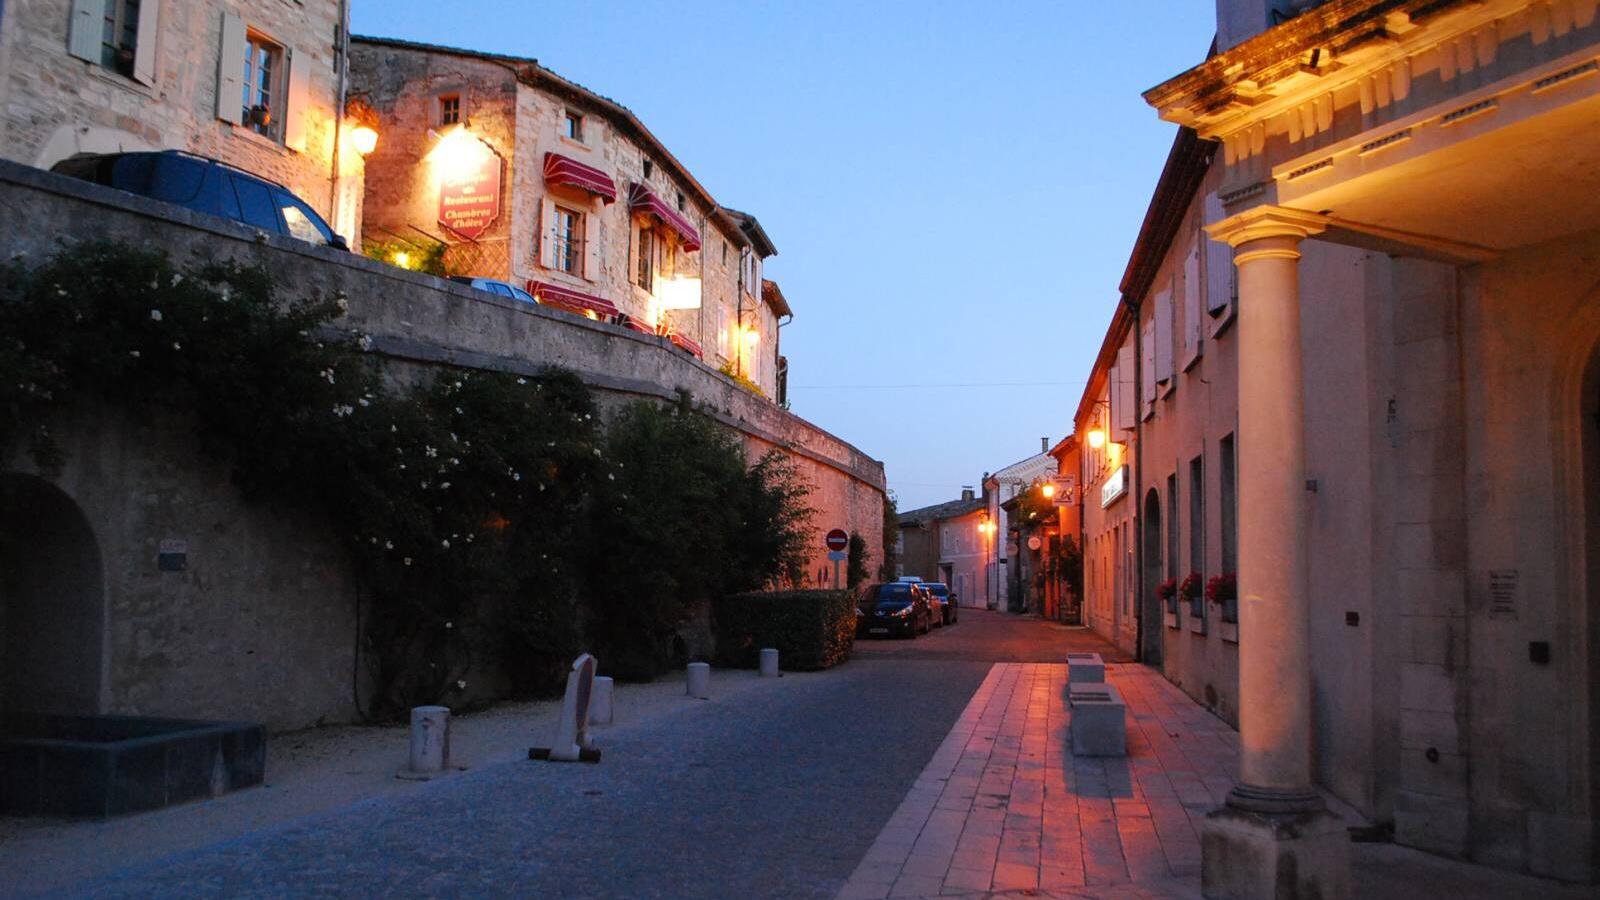 Grignan - ulička v noci